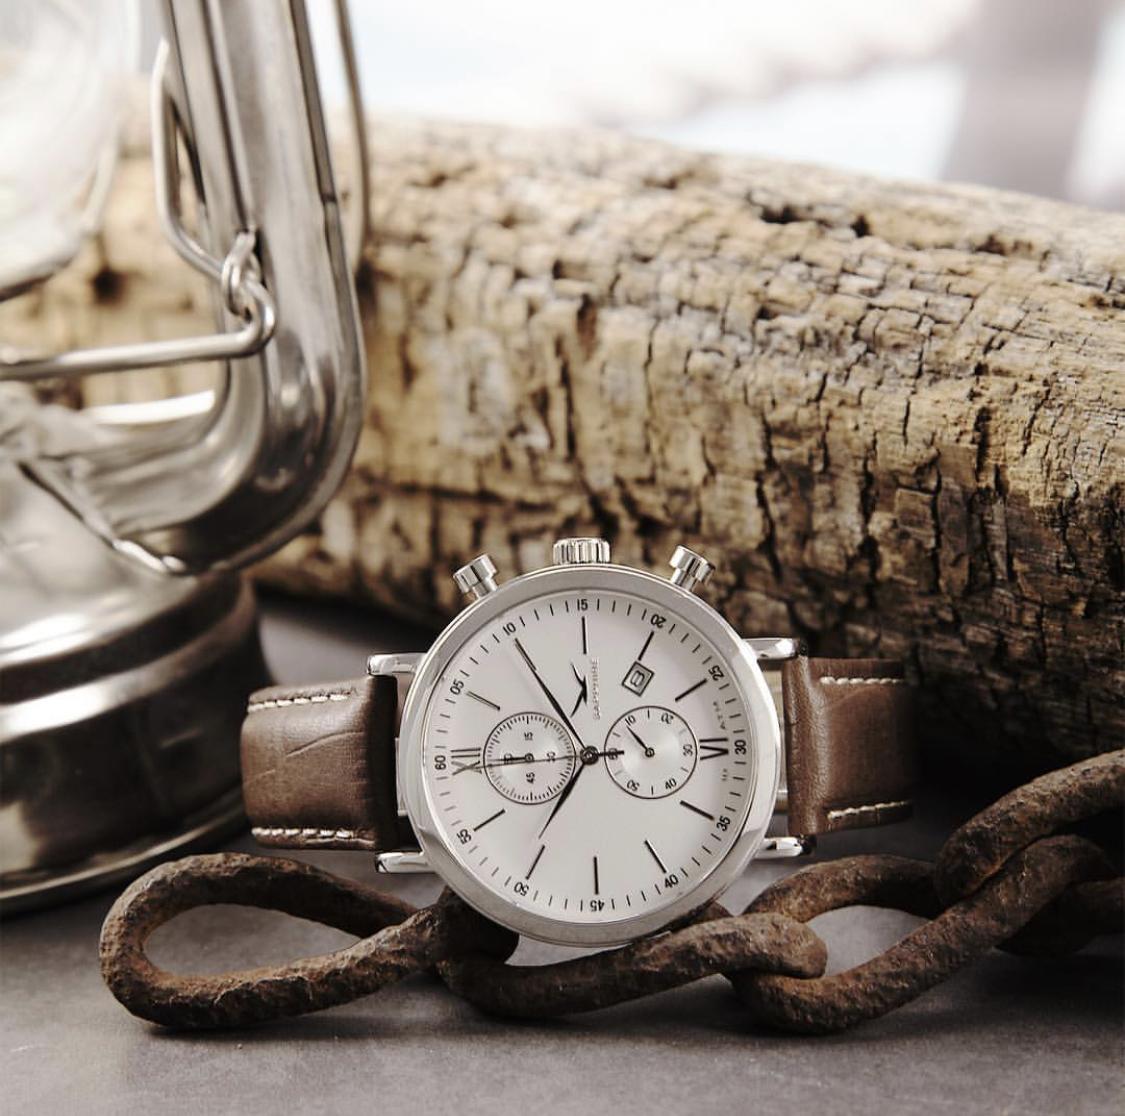 Gulwatches Swedish watchbrand's webshop